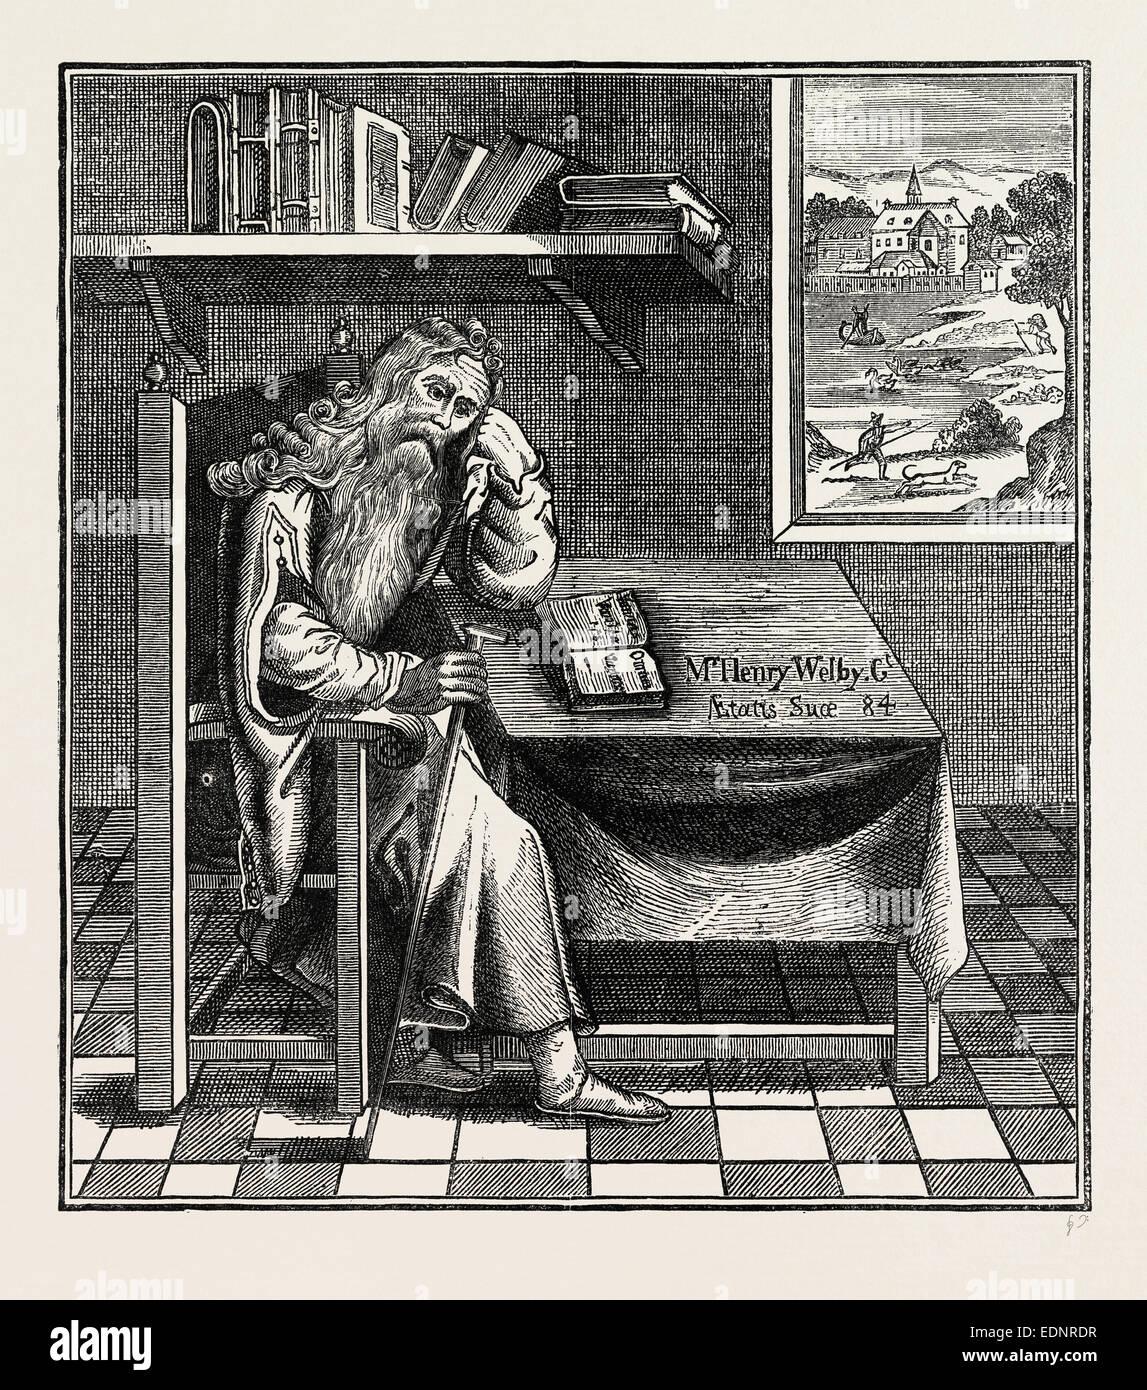 THE GRUB STREET HERMIT. London, UK, 19th century engraving - Stock Image